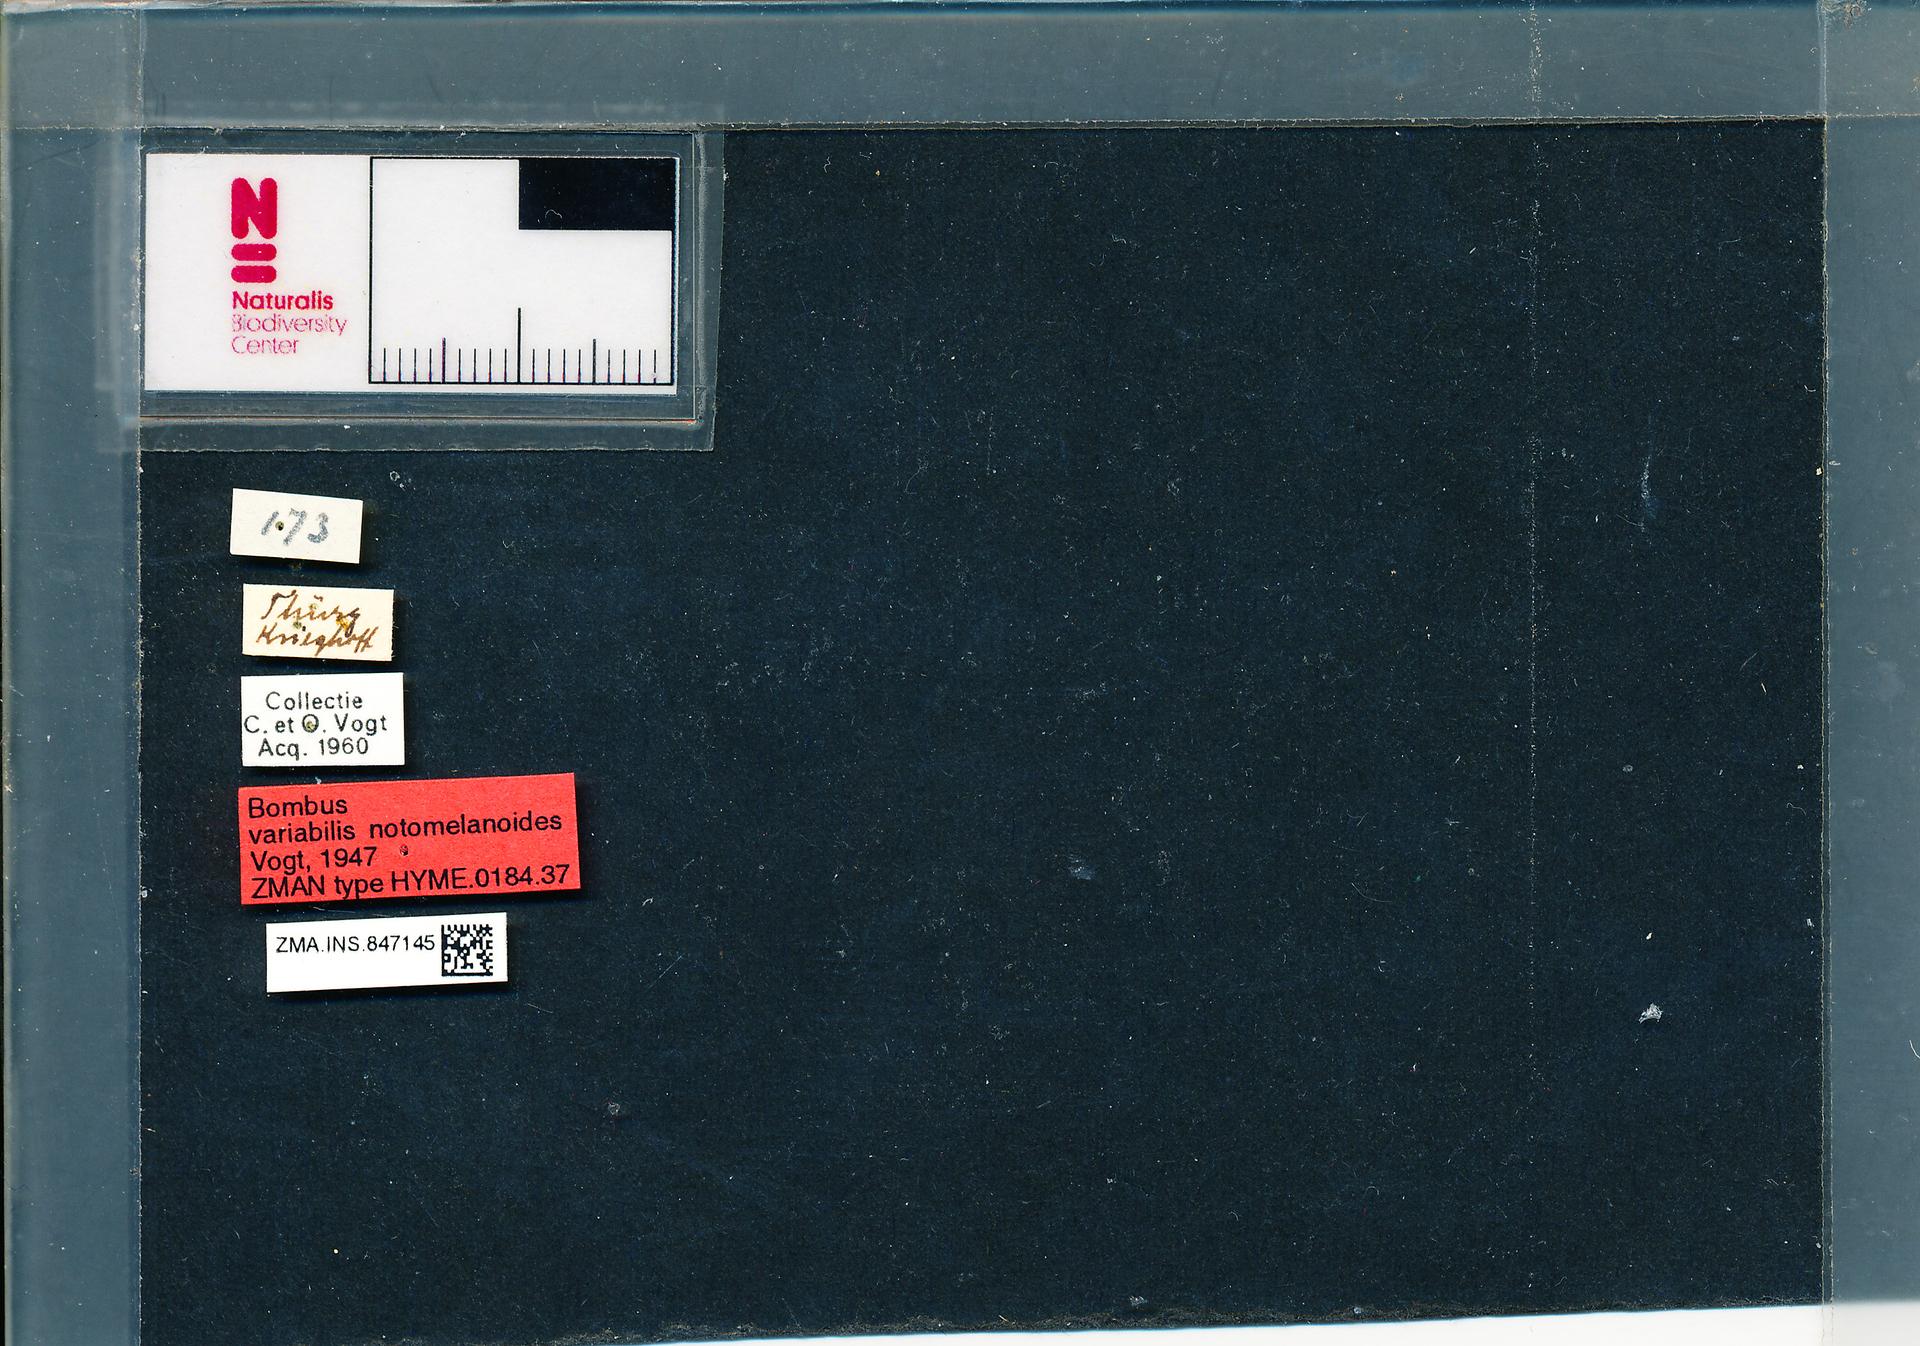 ZMA.INS.847145 | Bombus (Thoracobombus) humilis humilis s.s. Vogt, 1947